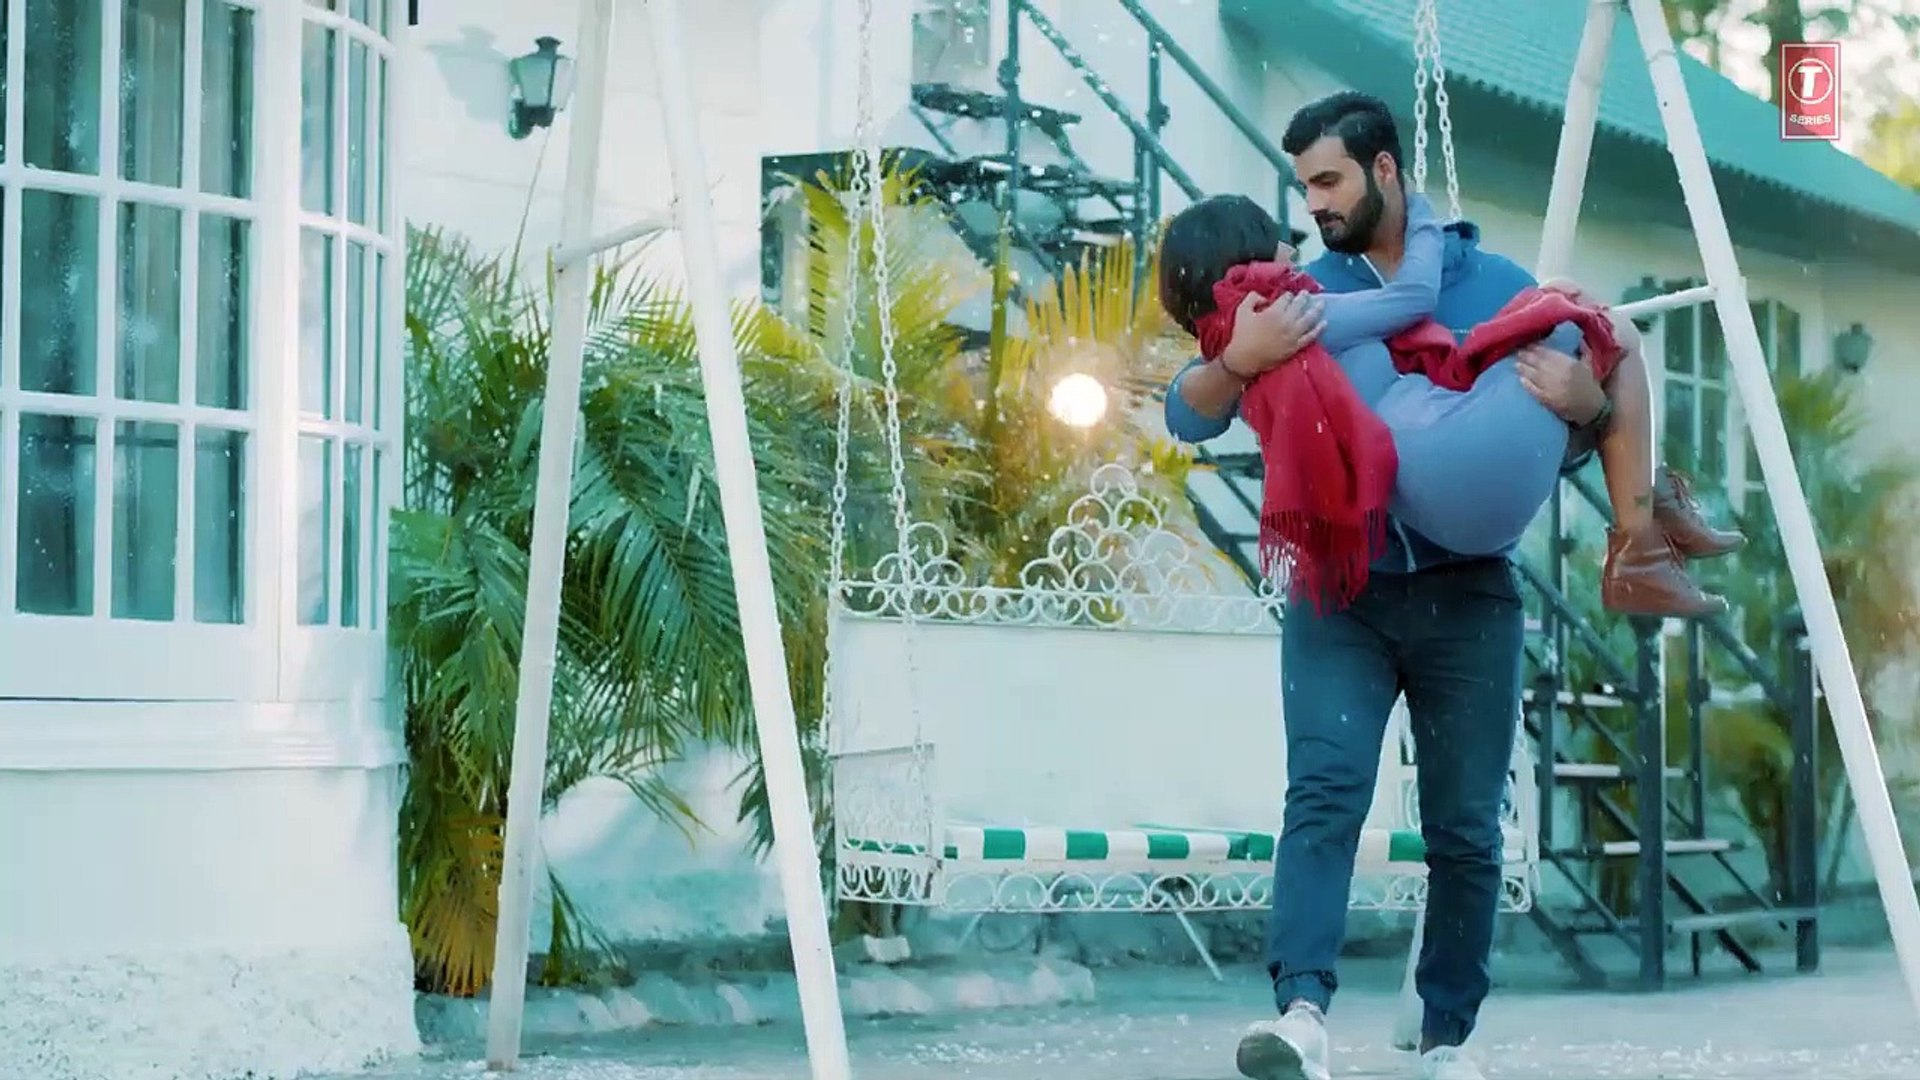 Rabb Vargeya (Full Song) Balraj | G Guri | Singh Jeet | Latest Punjabi  Songs 2019 | New Punjabi Songs 2019 | New Swag Videos